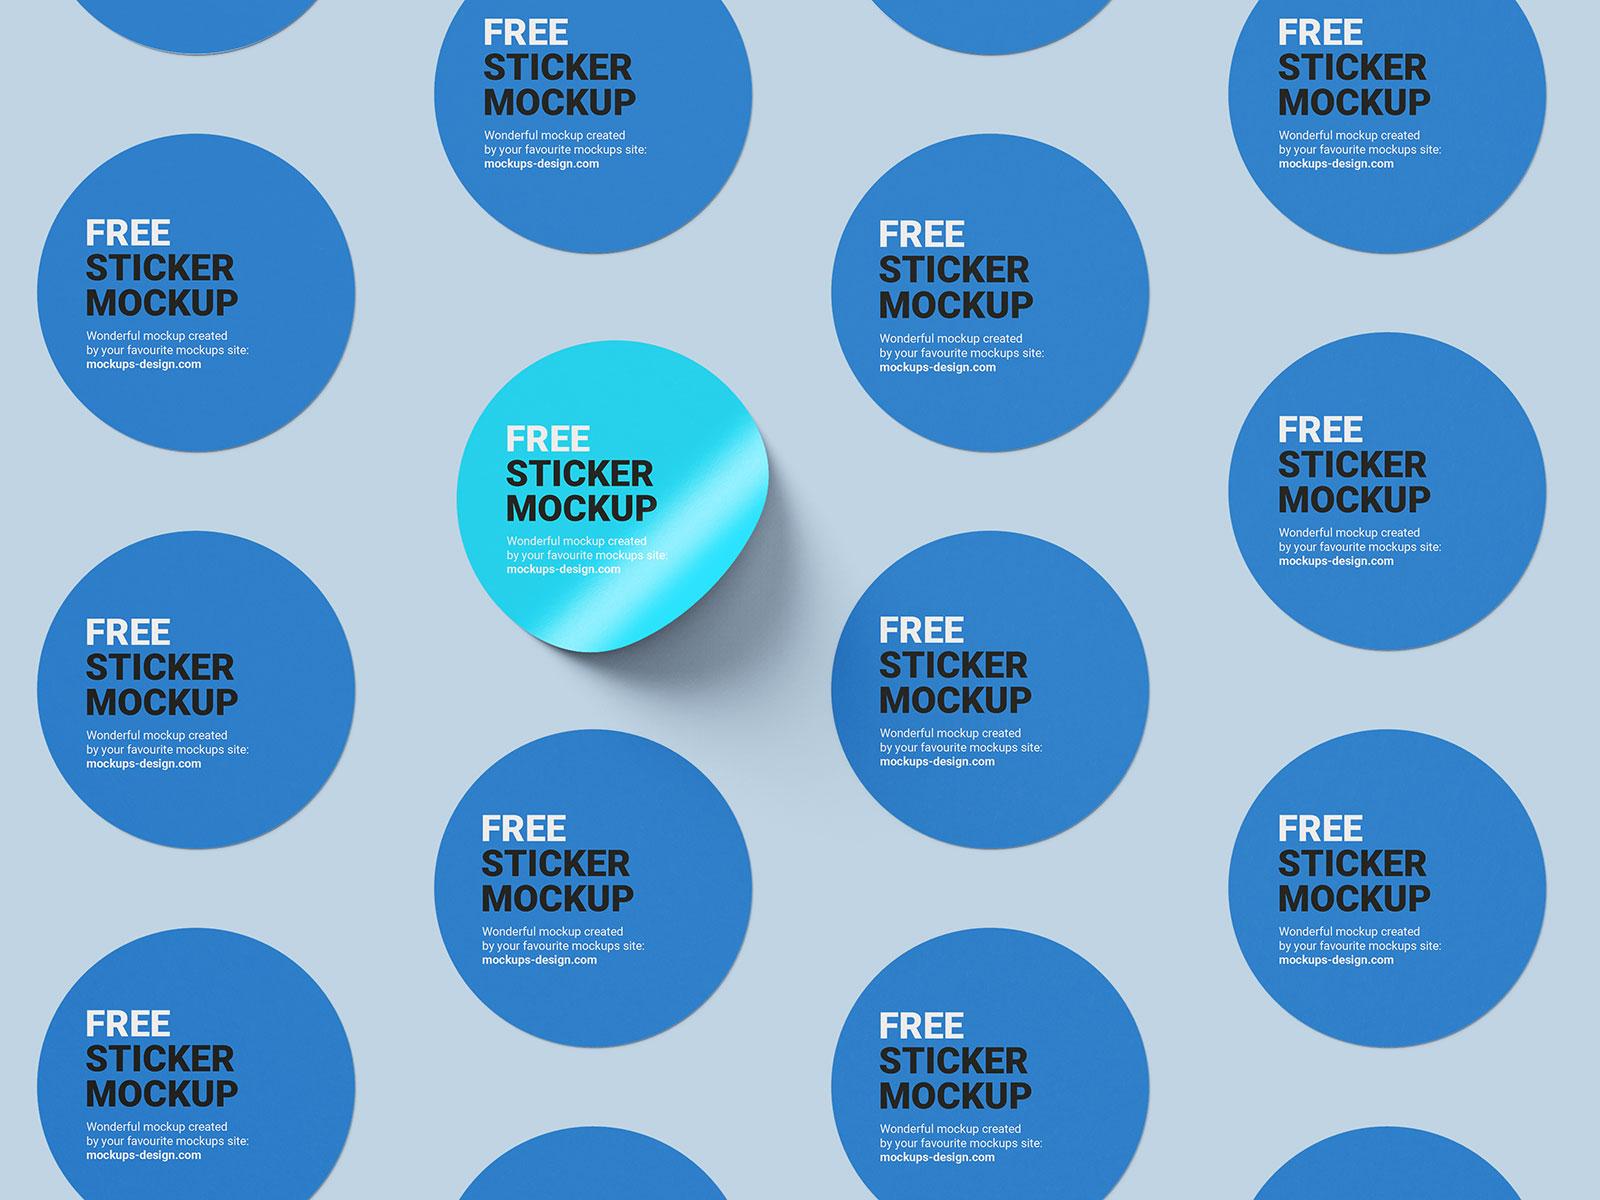 6 Free Round Sticker Mockup PSD Files